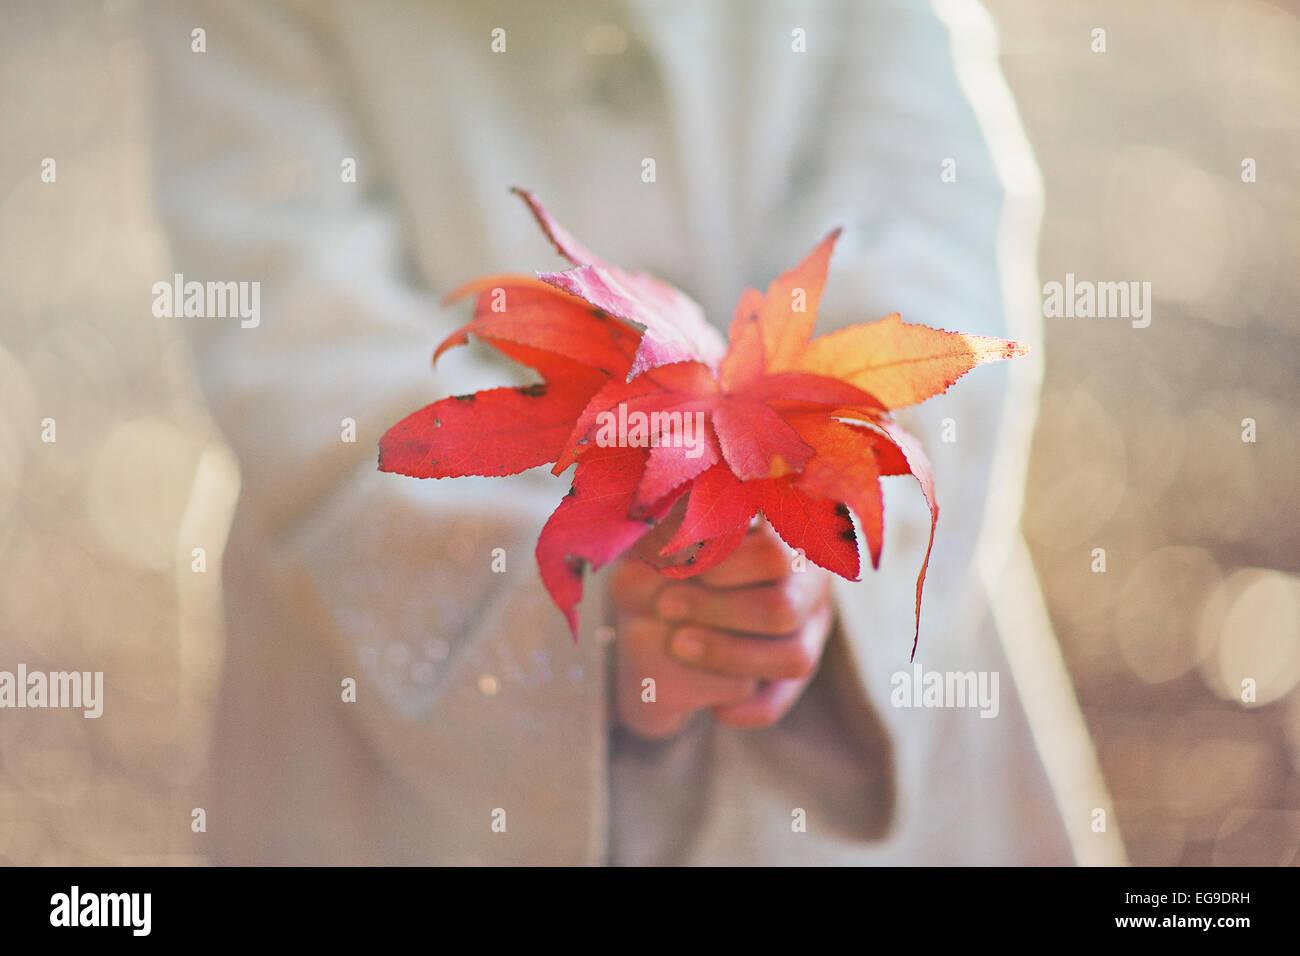 Mädchen halten fallen Blätter Stockbild